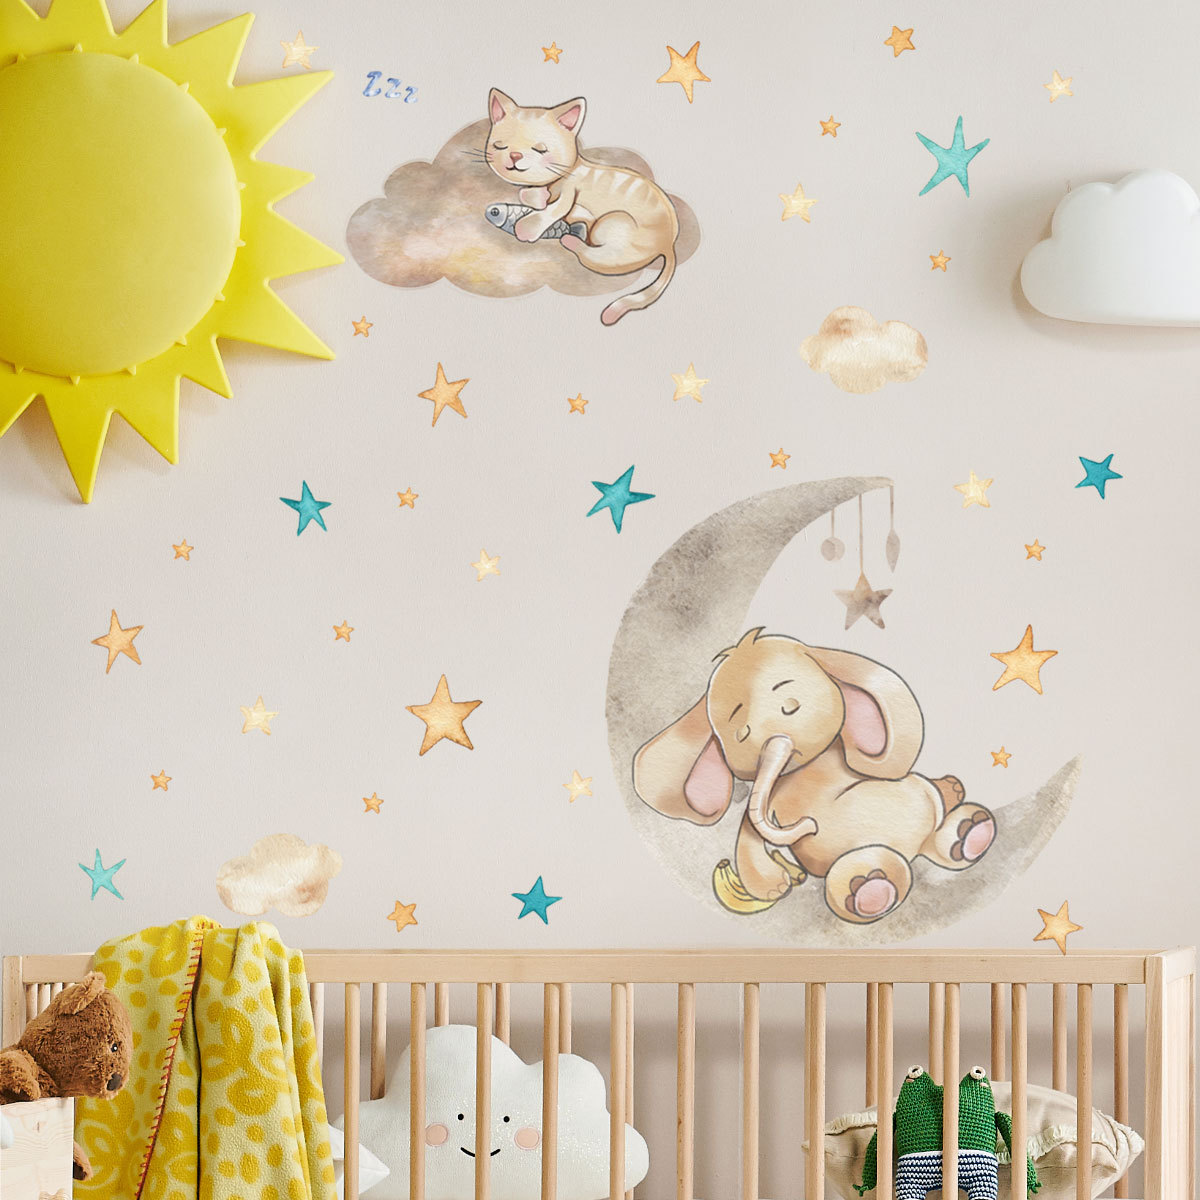 Cute Cartoon Animal Wall Sticker For Kids Baby Bedroom Nordic Style Vinyl Decorative Wall Elephant Cat Moon Stars Home Decor